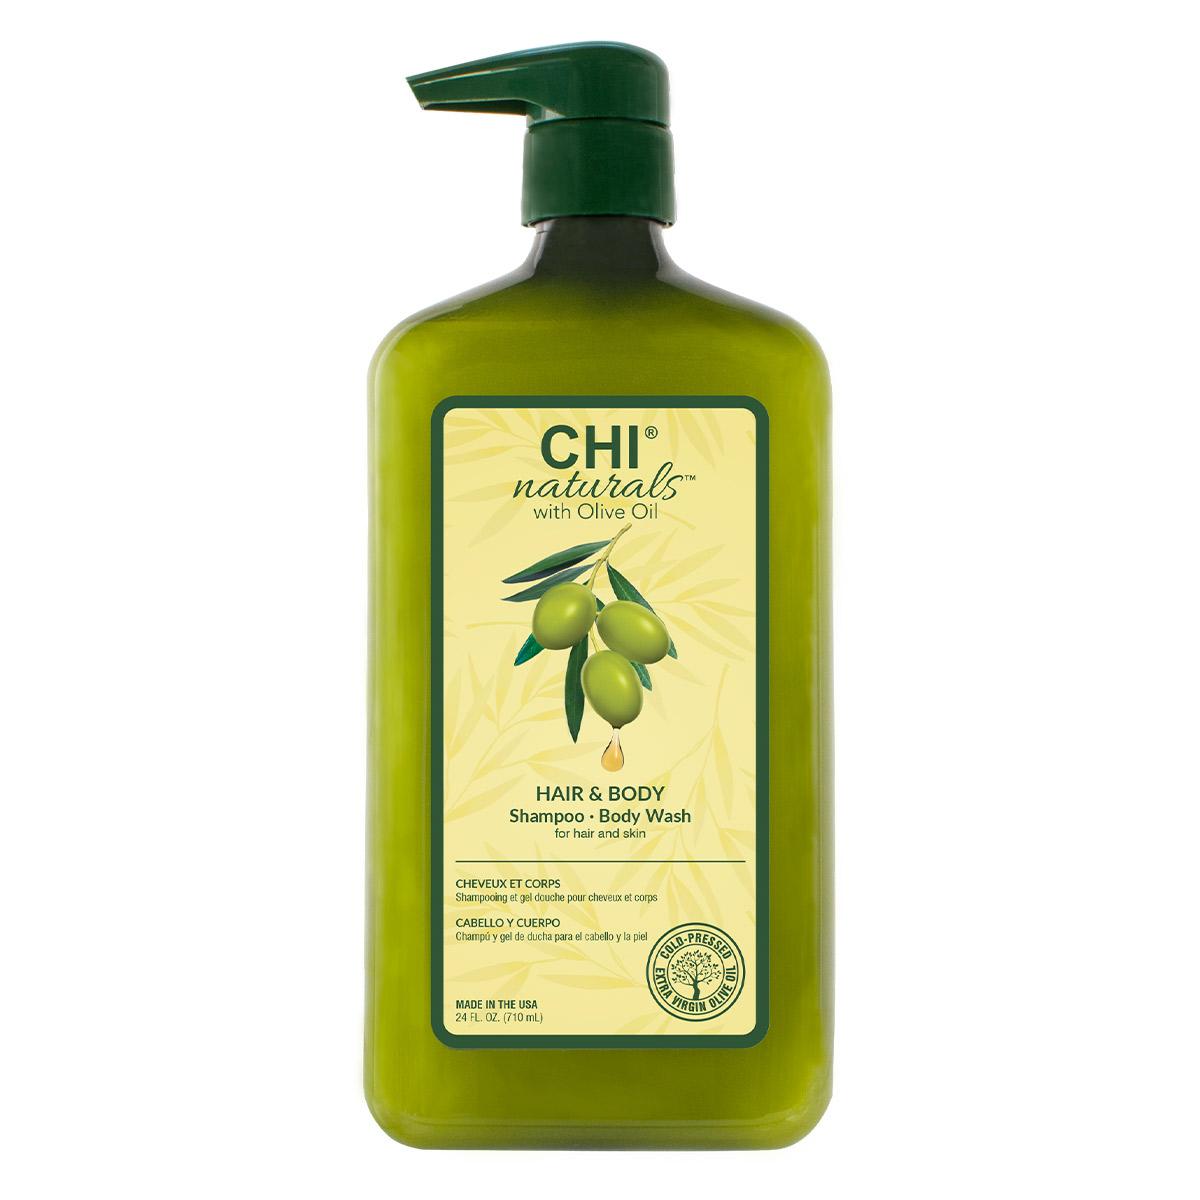 Olive Organics Hair & Body Shampoo